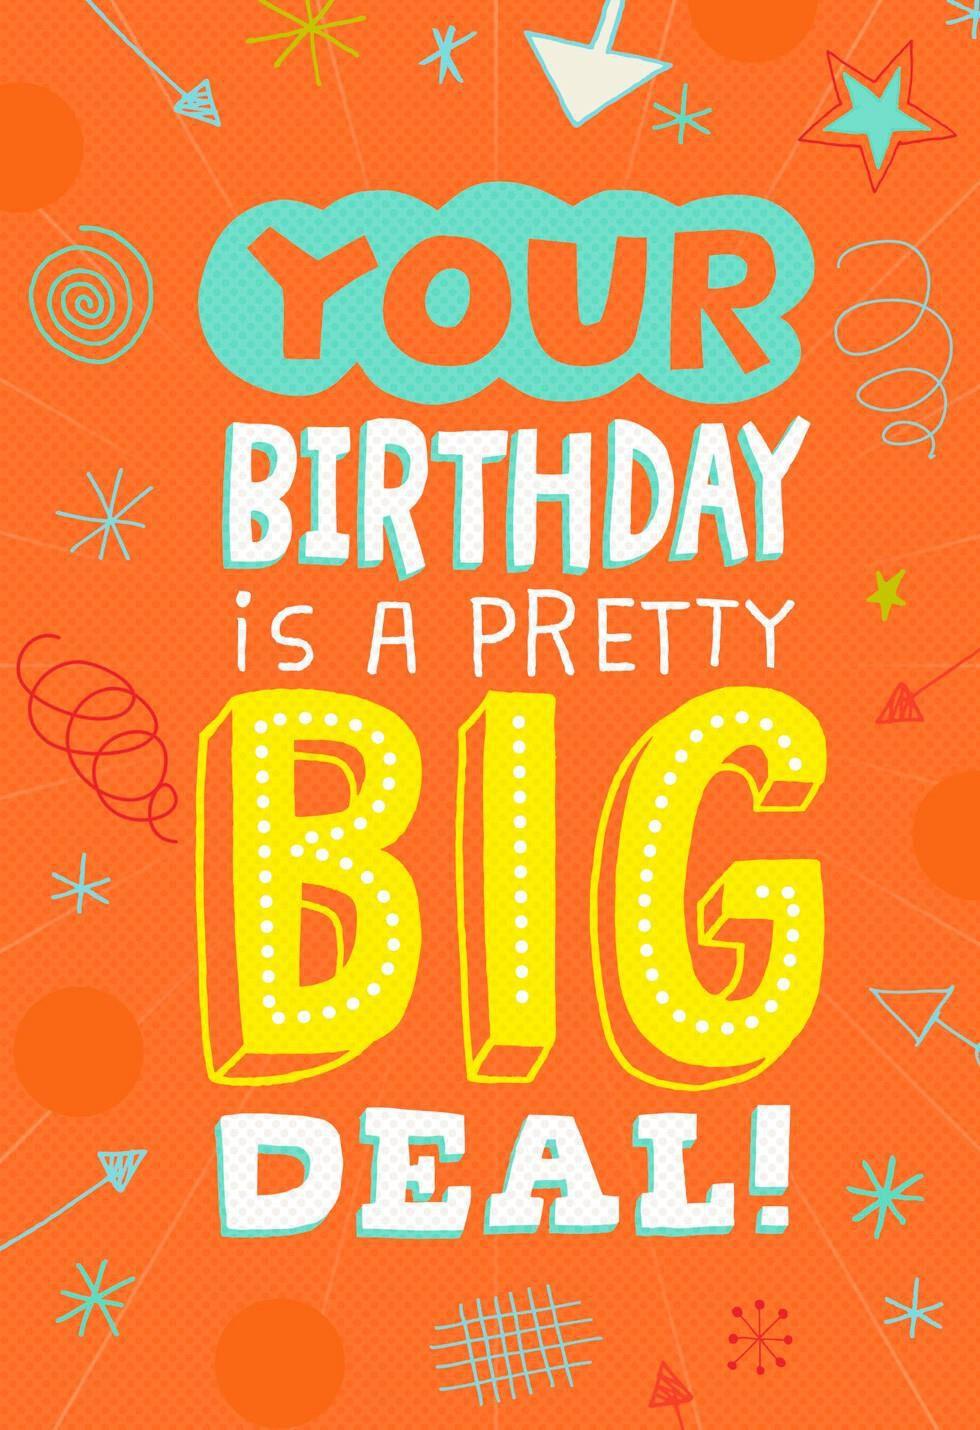 A Pretty Big Deal Musical Birthday Card Greeting Cards